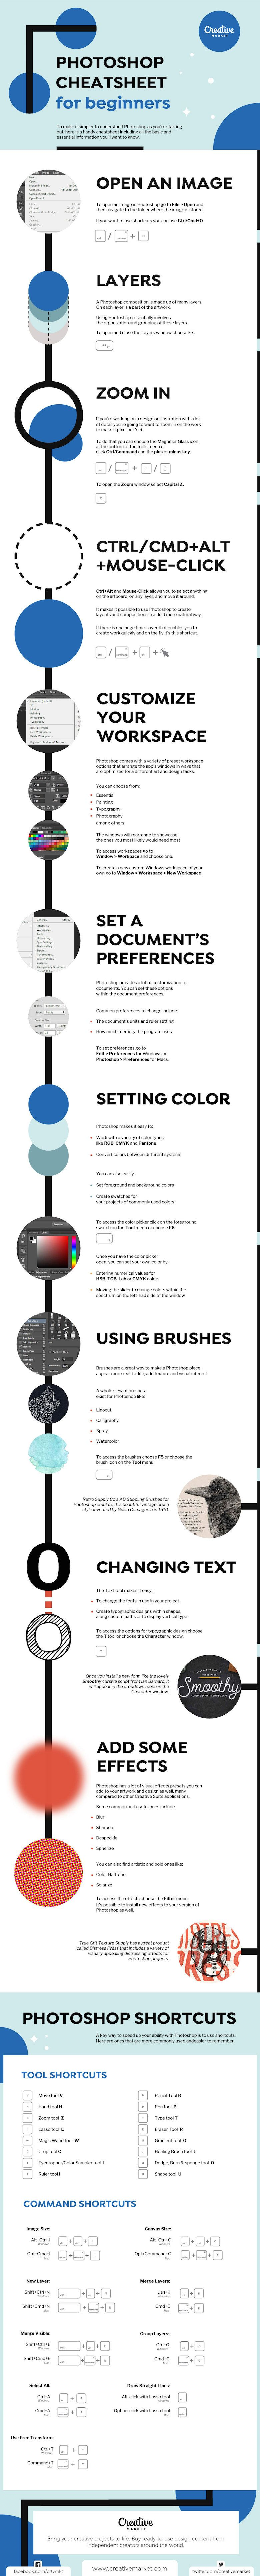 Learn basic photoshop tools and tricks with this handy cheat sheet learn basic photoshop tools and tricks with this handy cheat sheet for beginners baditri Choice Image